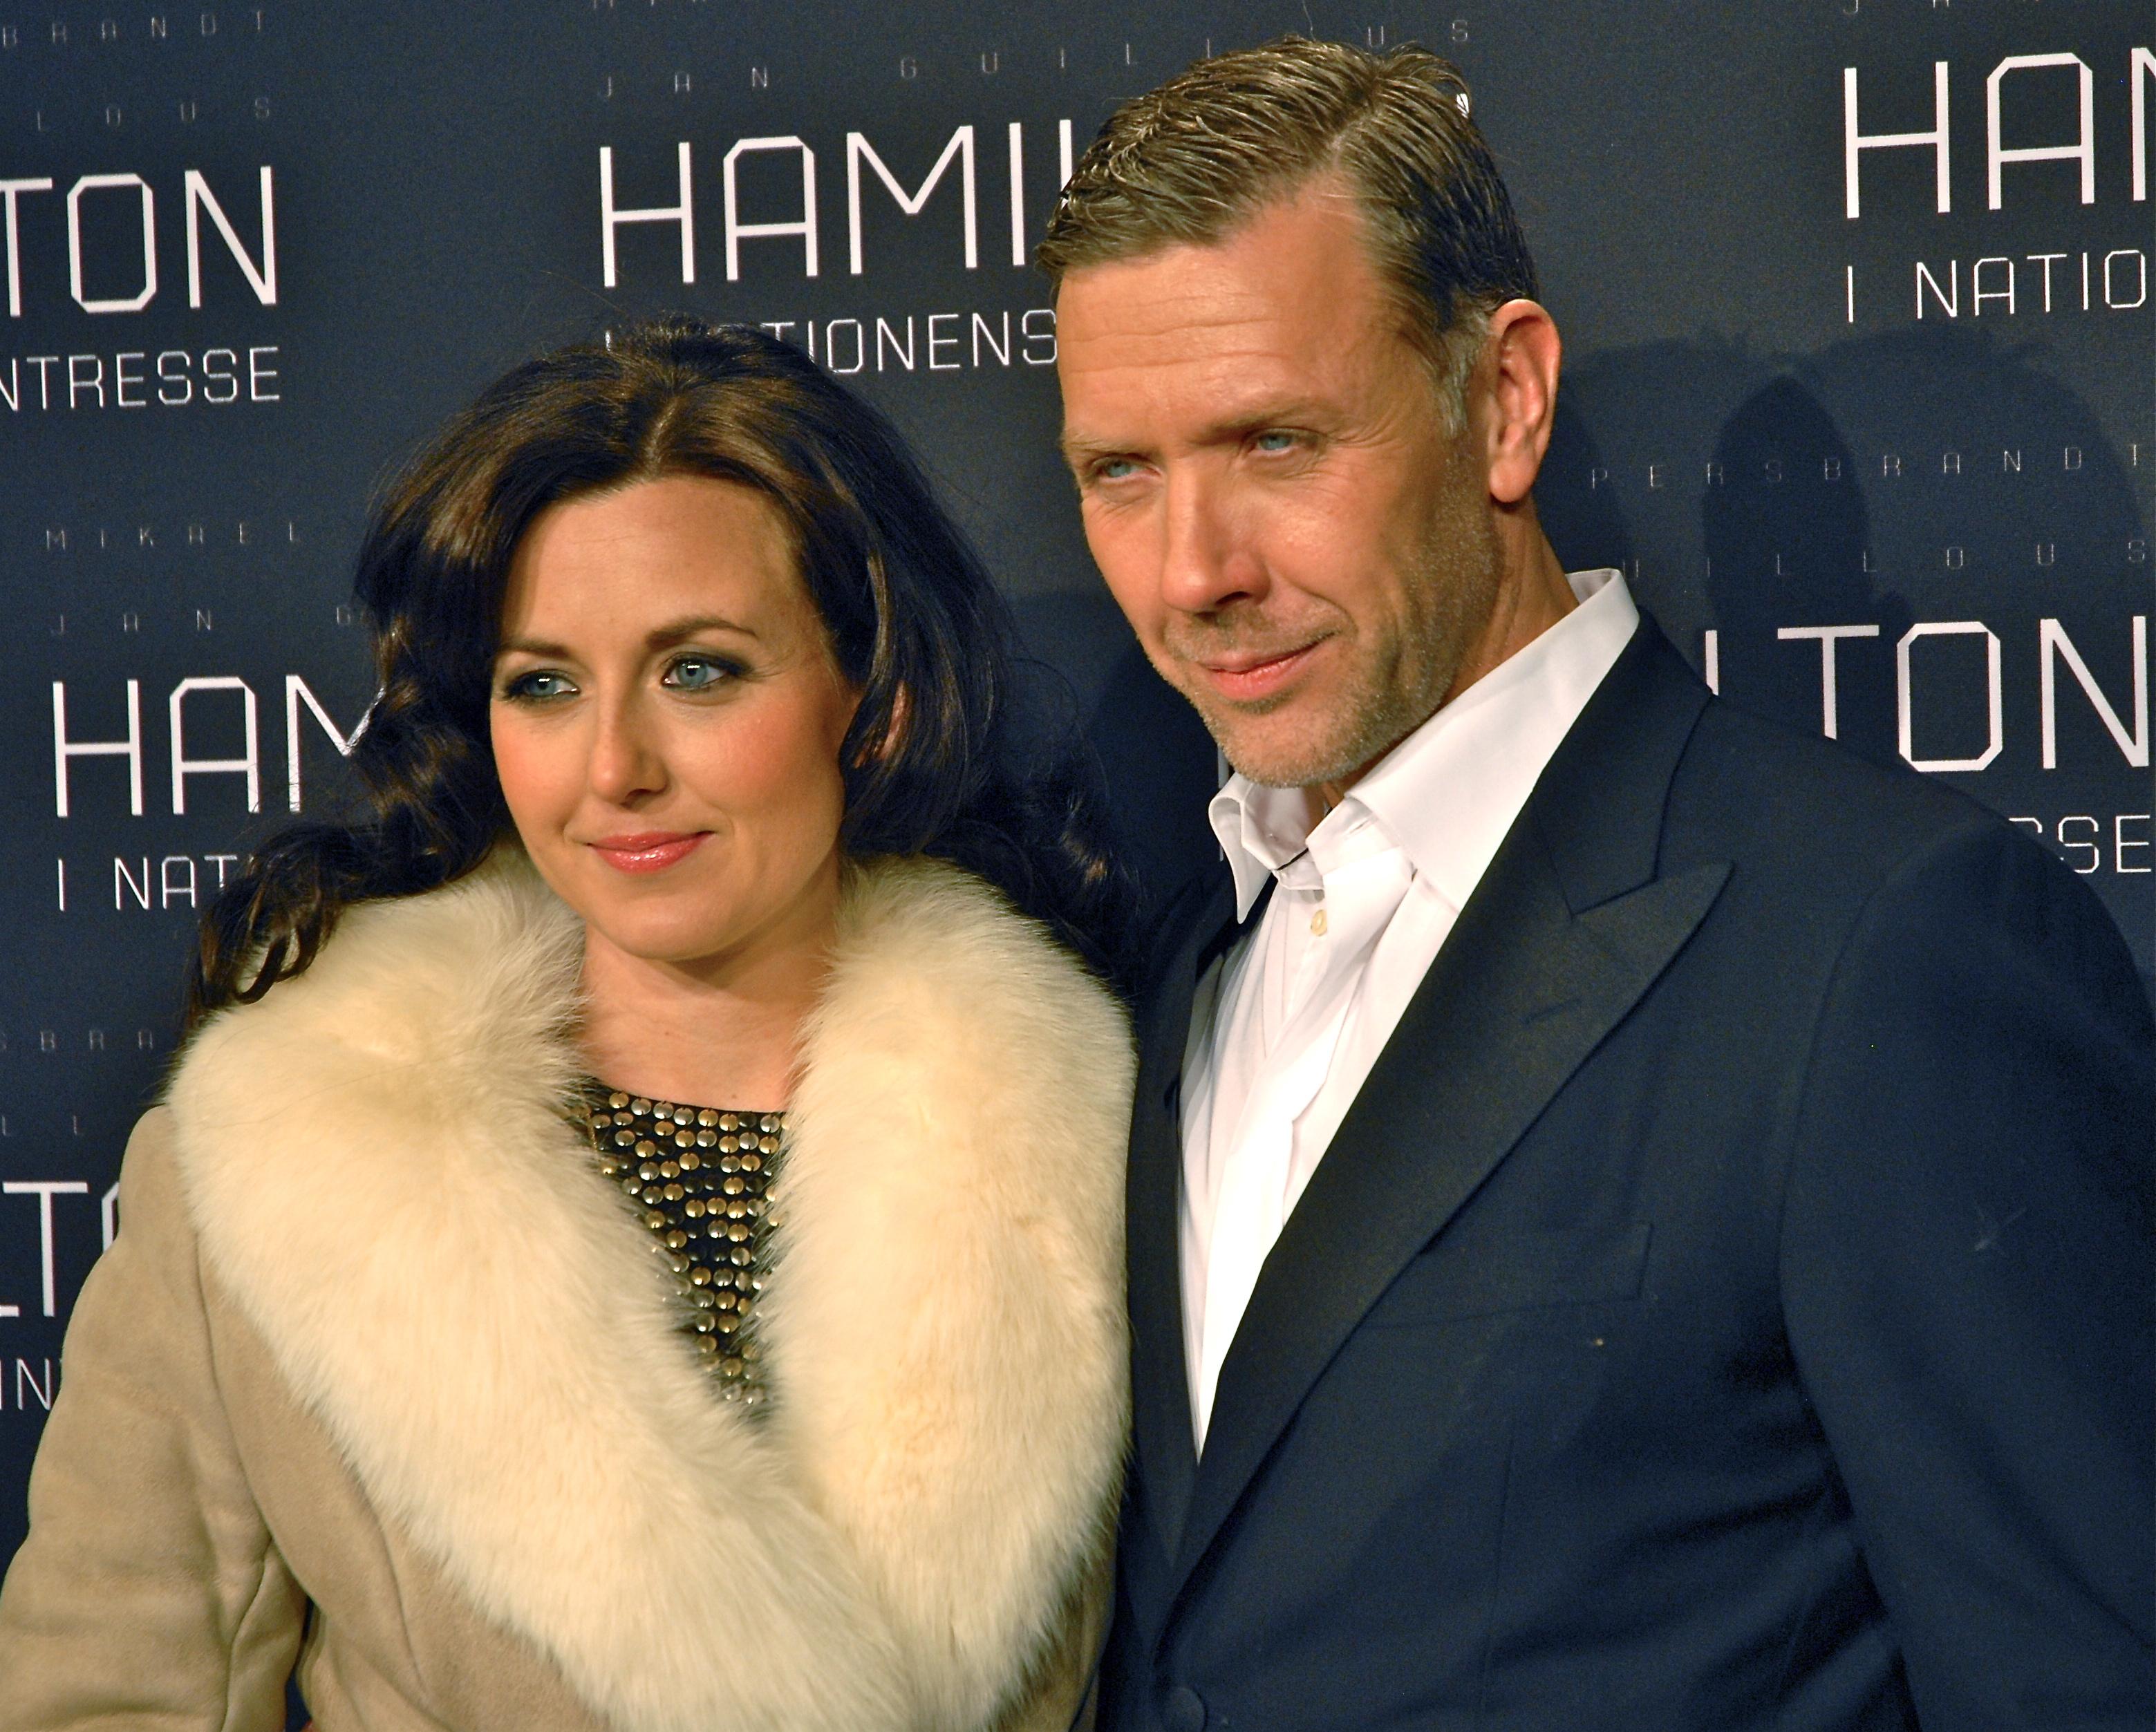 Mikael Persbrandt avec gracieuse, femme Sanna Lundell